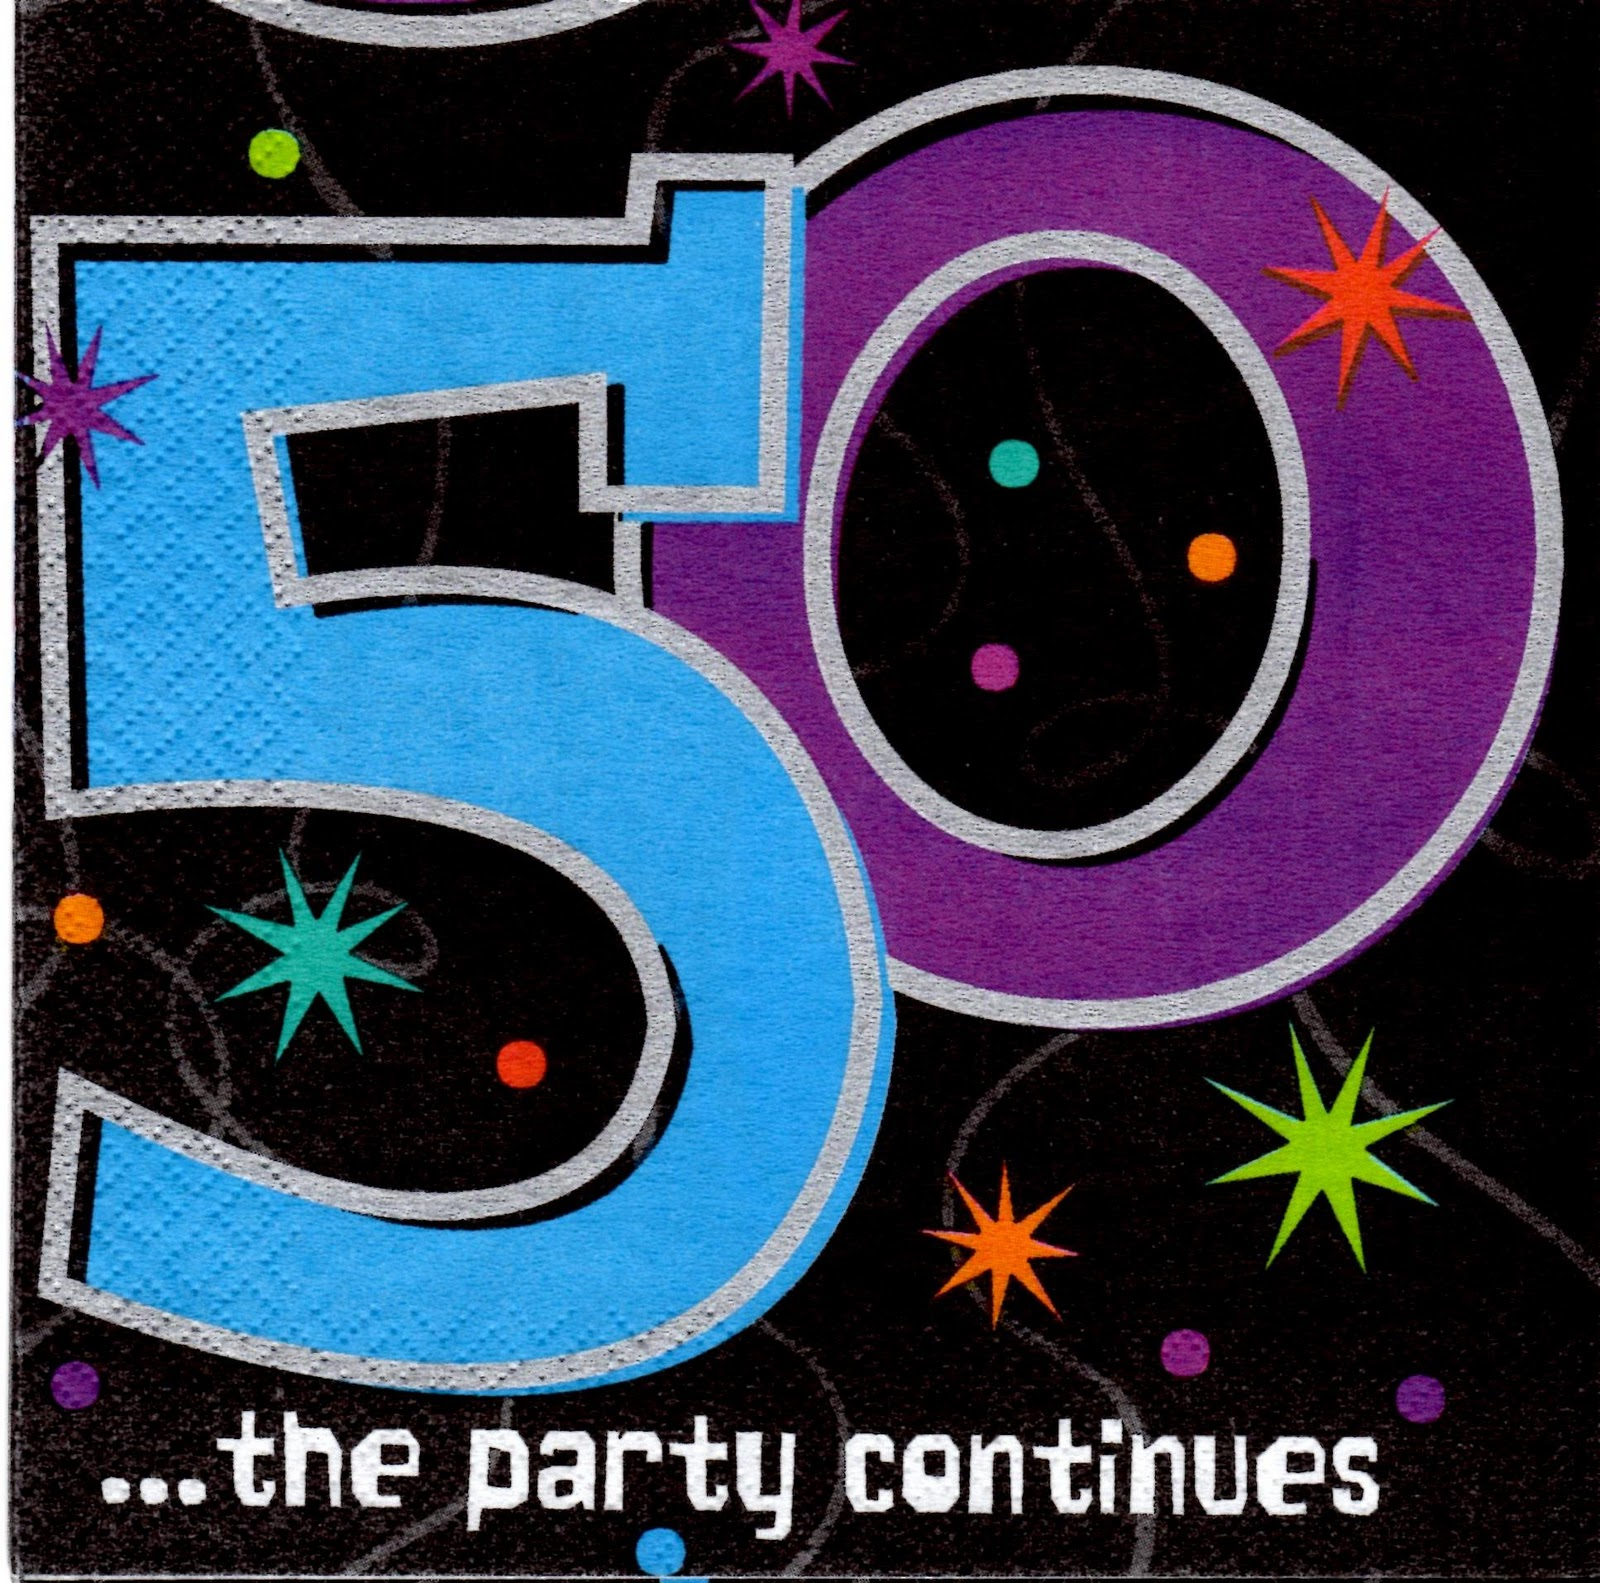 Party Cakes: 50th Birthday Cake